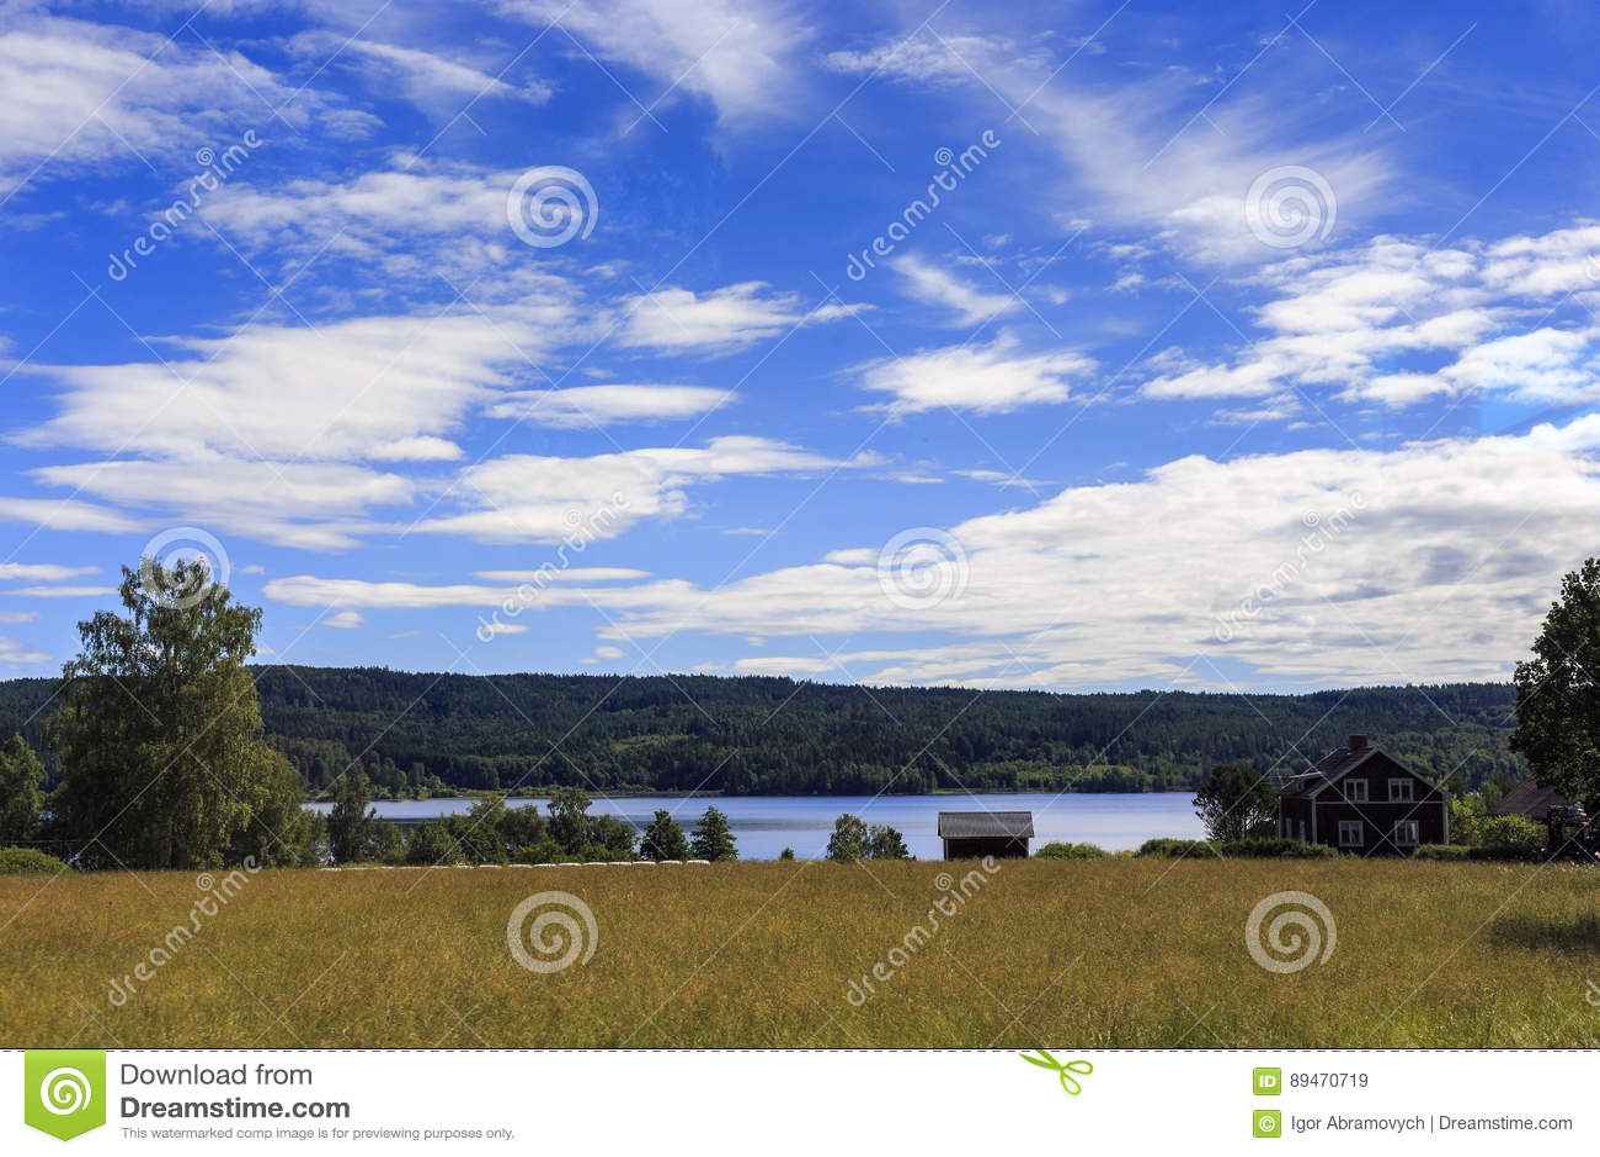 Northern Swedish landscape